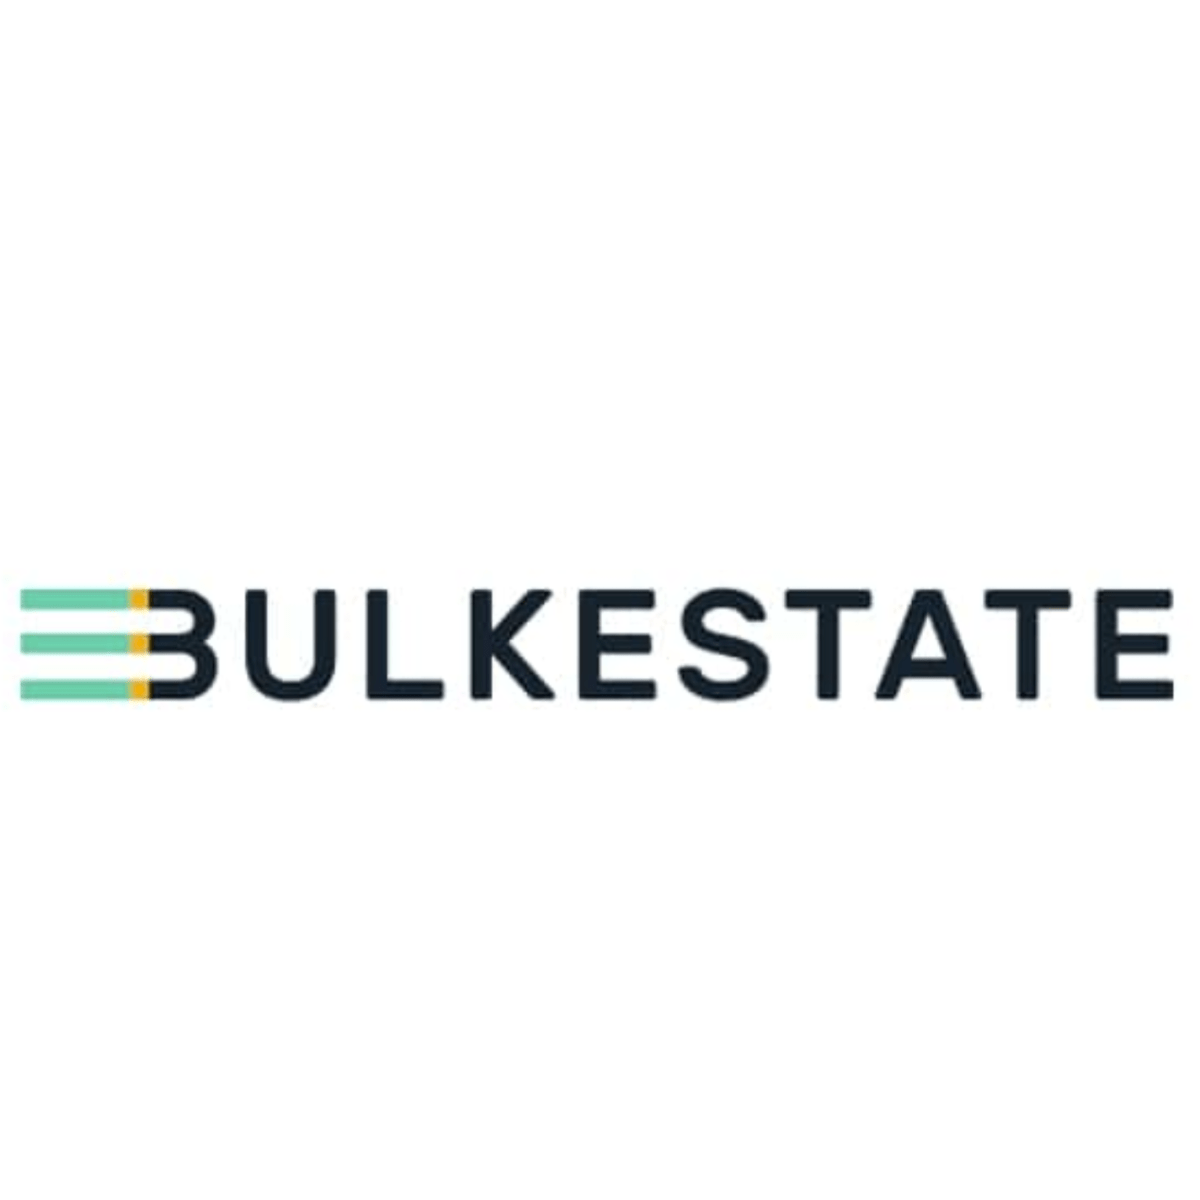 BulkEstate Logo @ Savings4Freedom